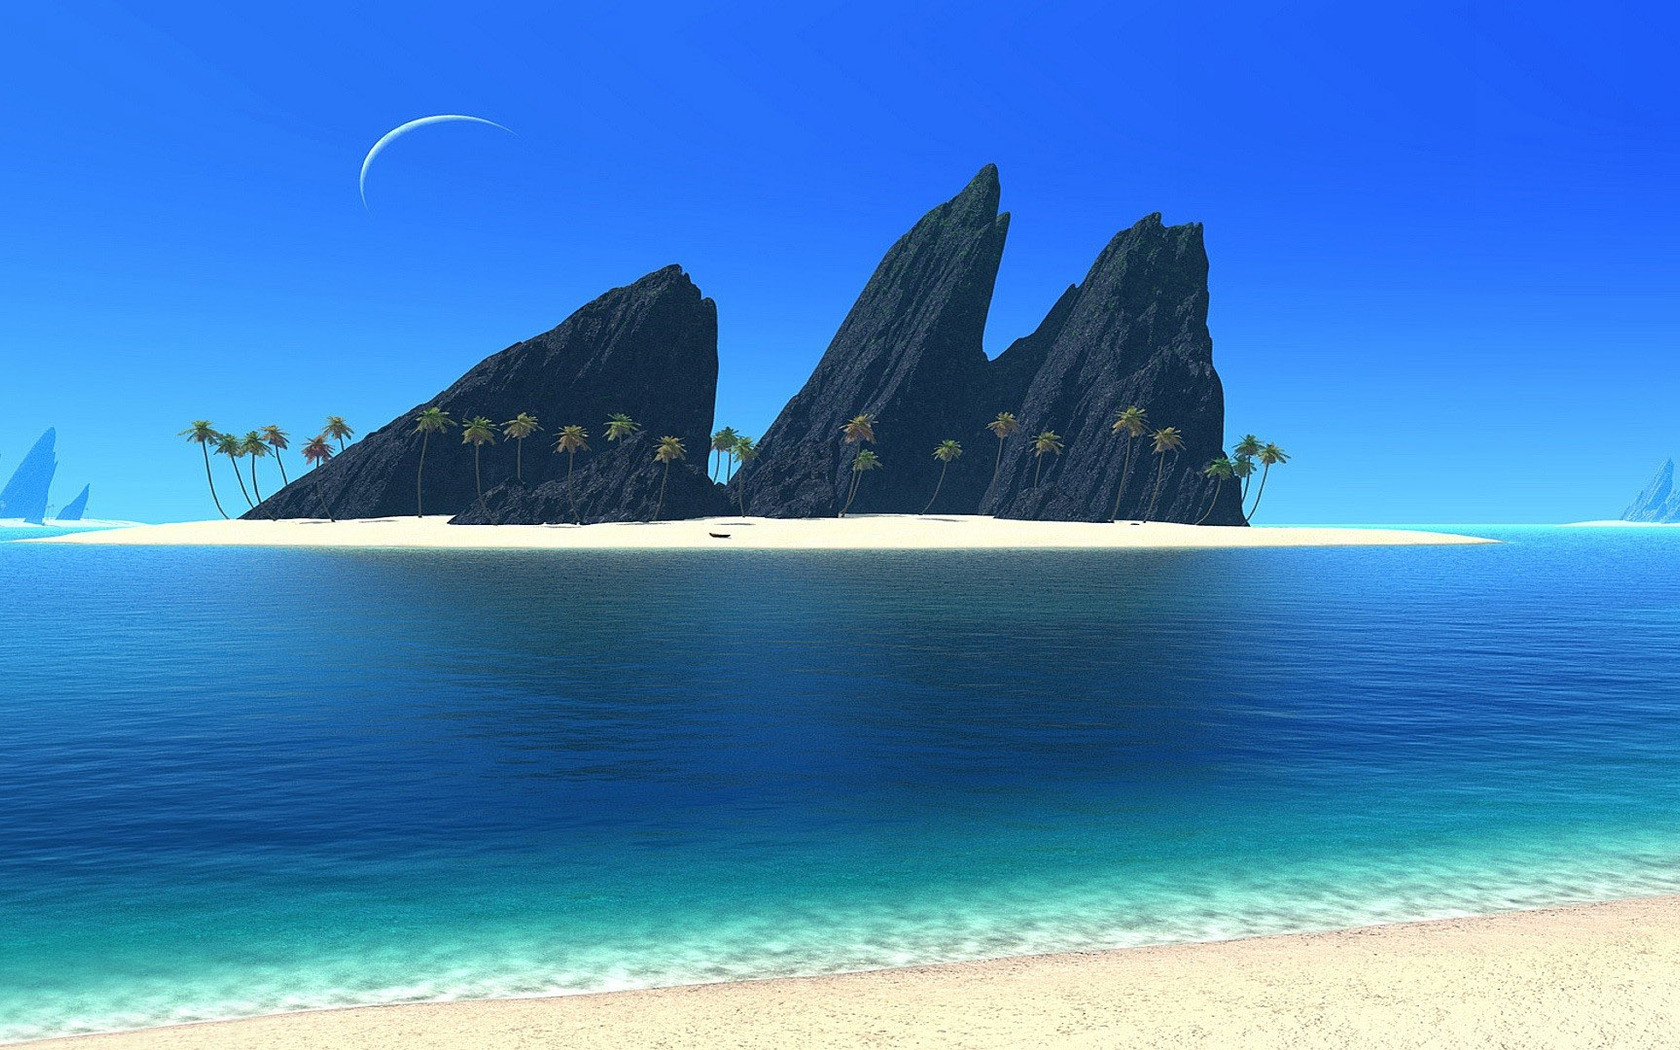 Sunny beach wallpaper 12378 1680x1050